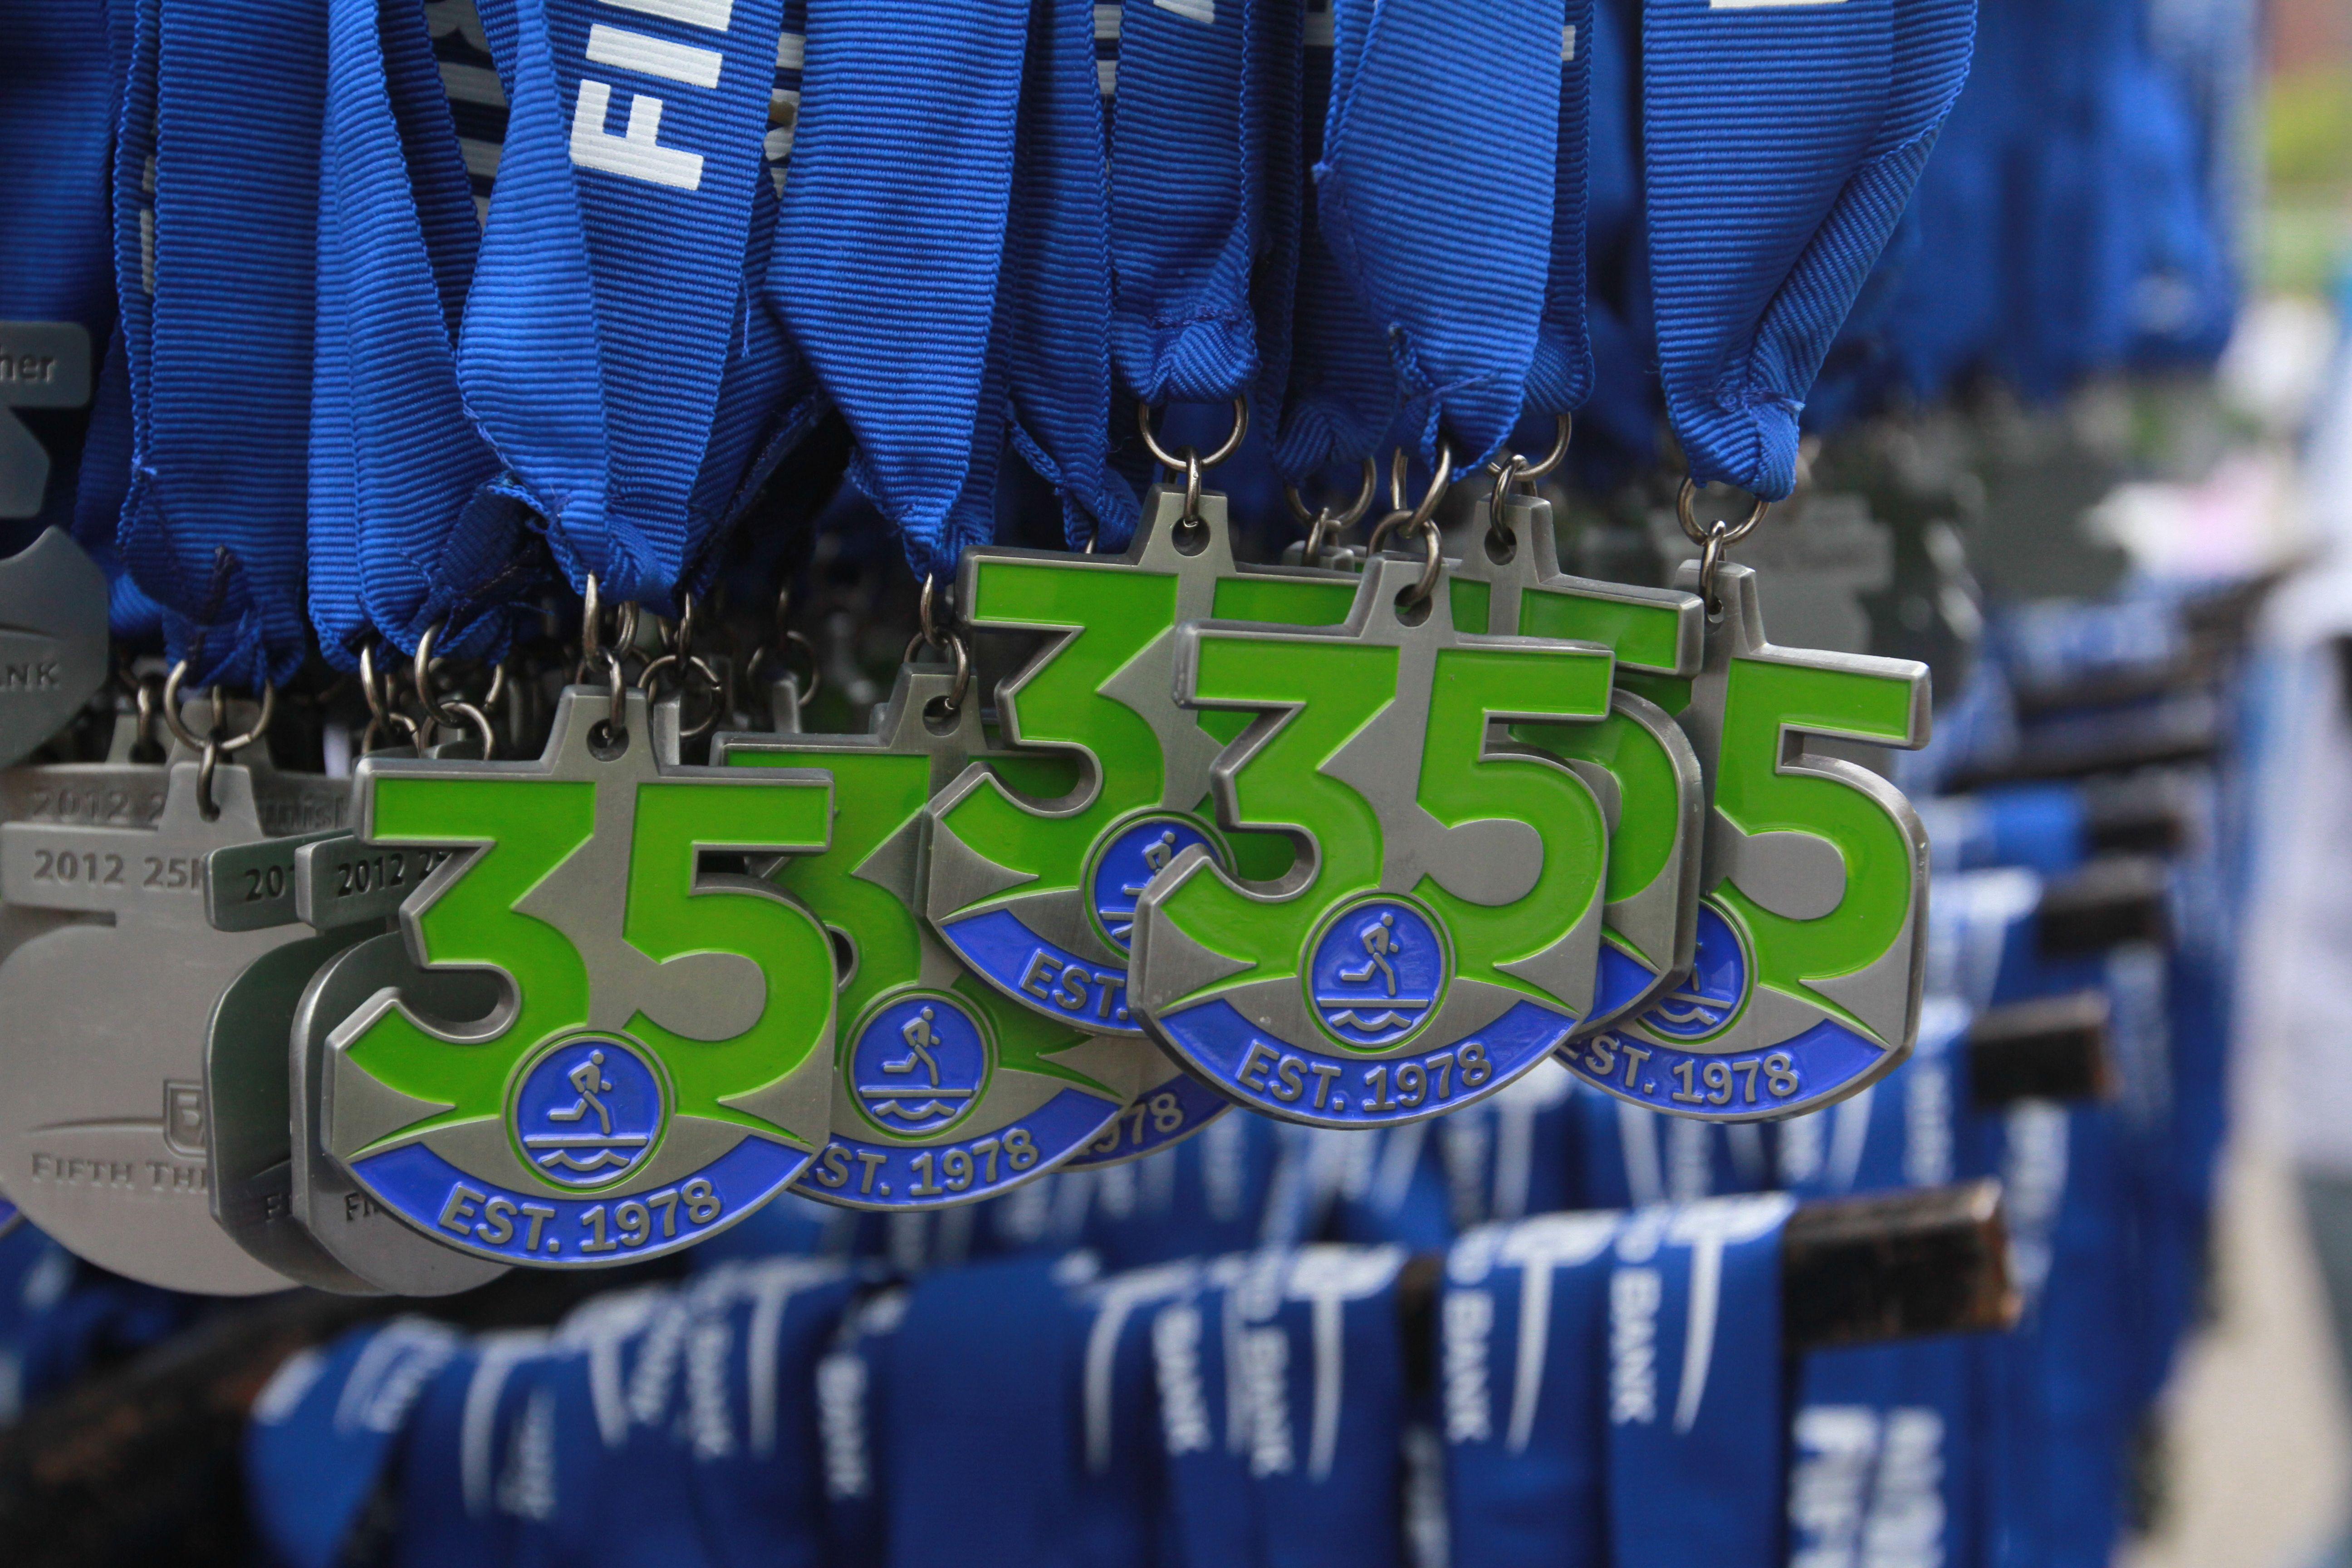 Fifth third river bank run 35 anniversary medals medallas